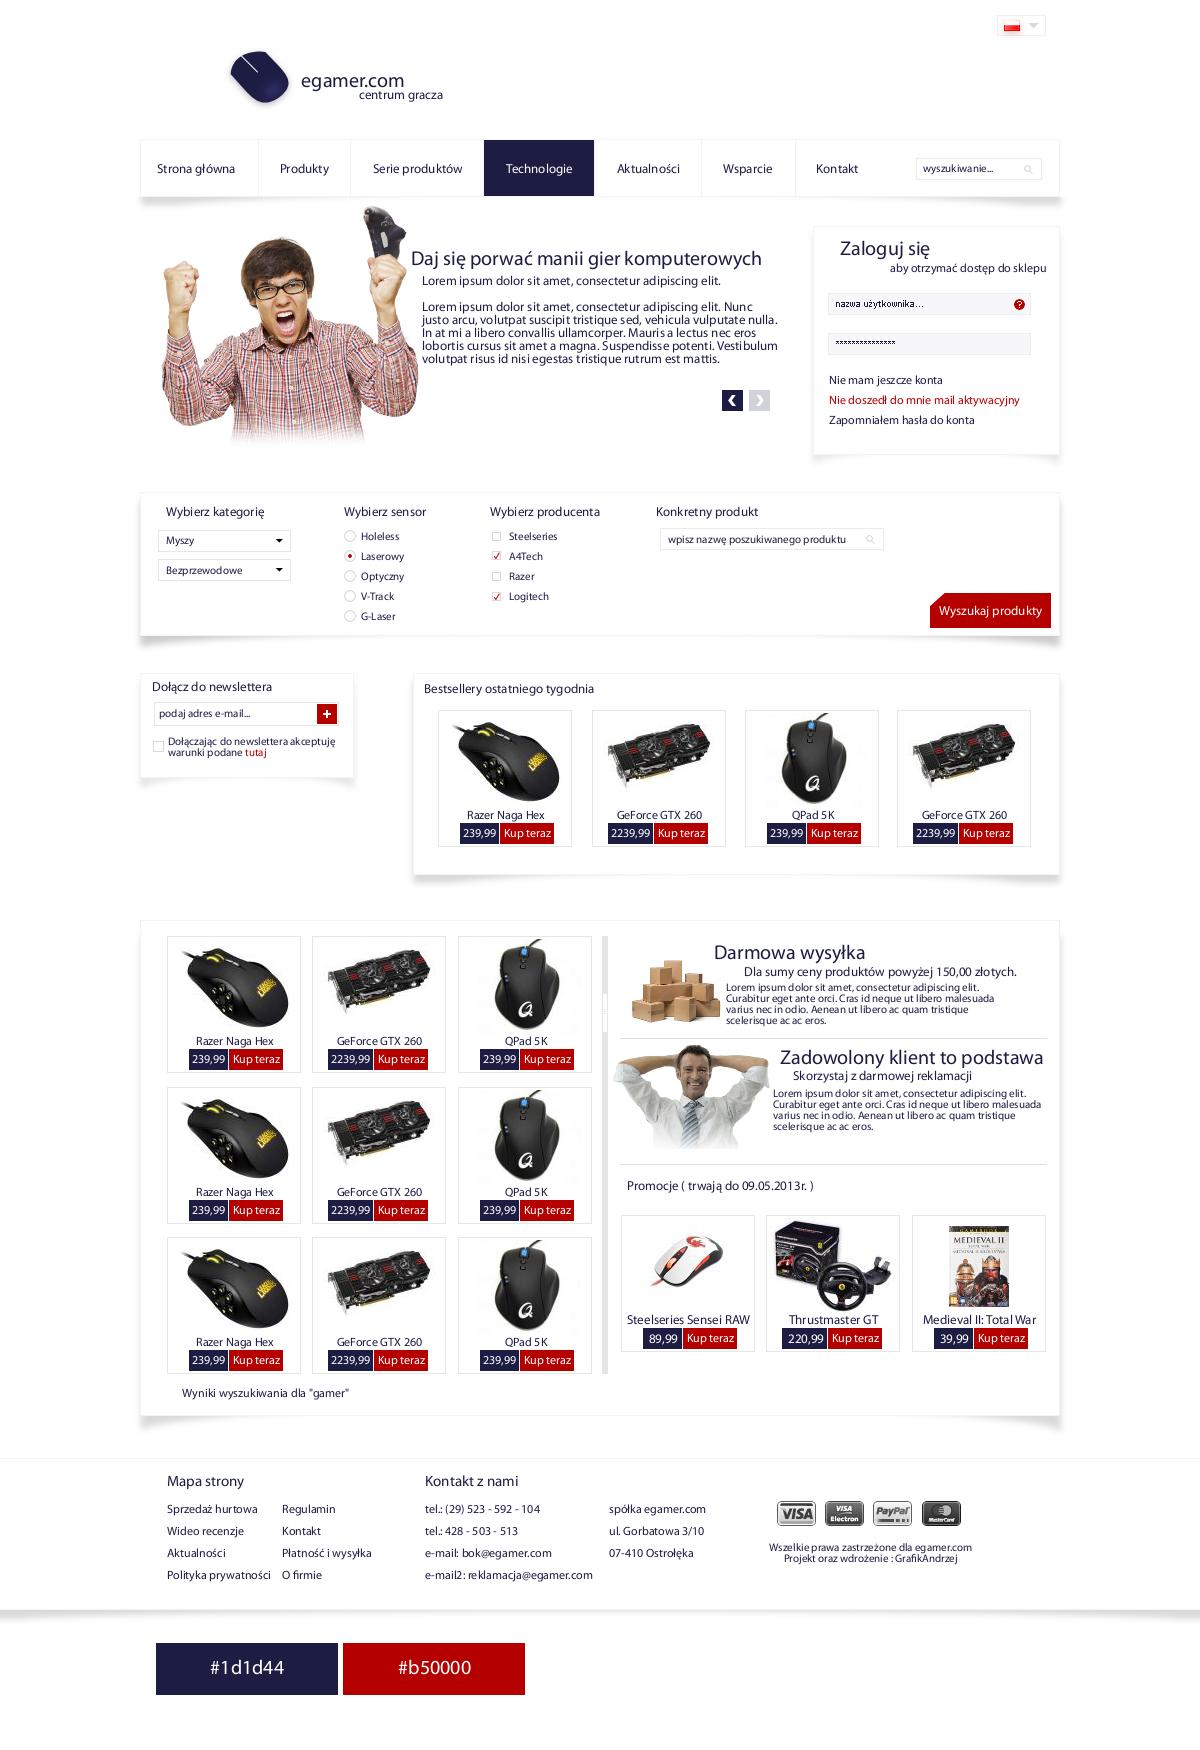 shop_by_grafikandrzej-d64ghkc.png